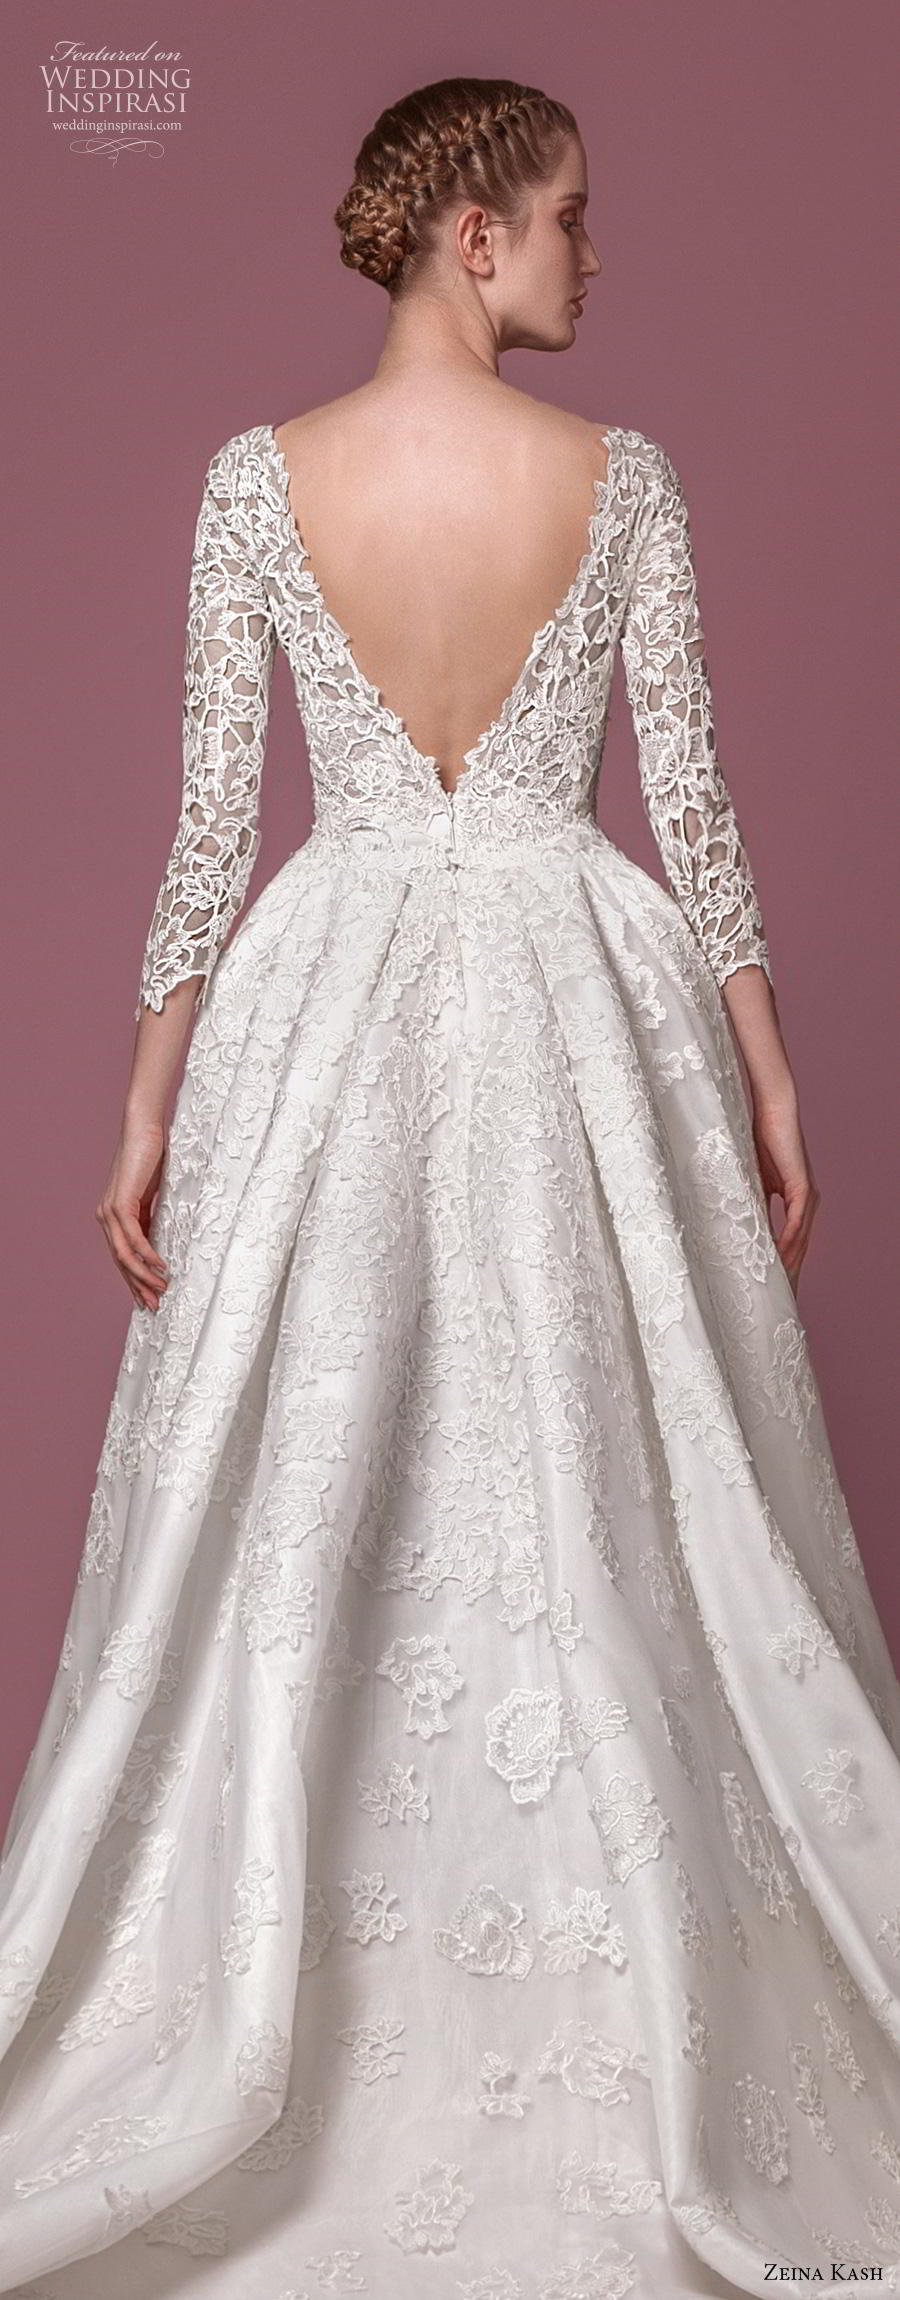 zeina kash 2018 bridal three quarter sleeves deep plunging v neck full embellishment elegant lace a  line wedding dress open v back chapel train (5) zbv